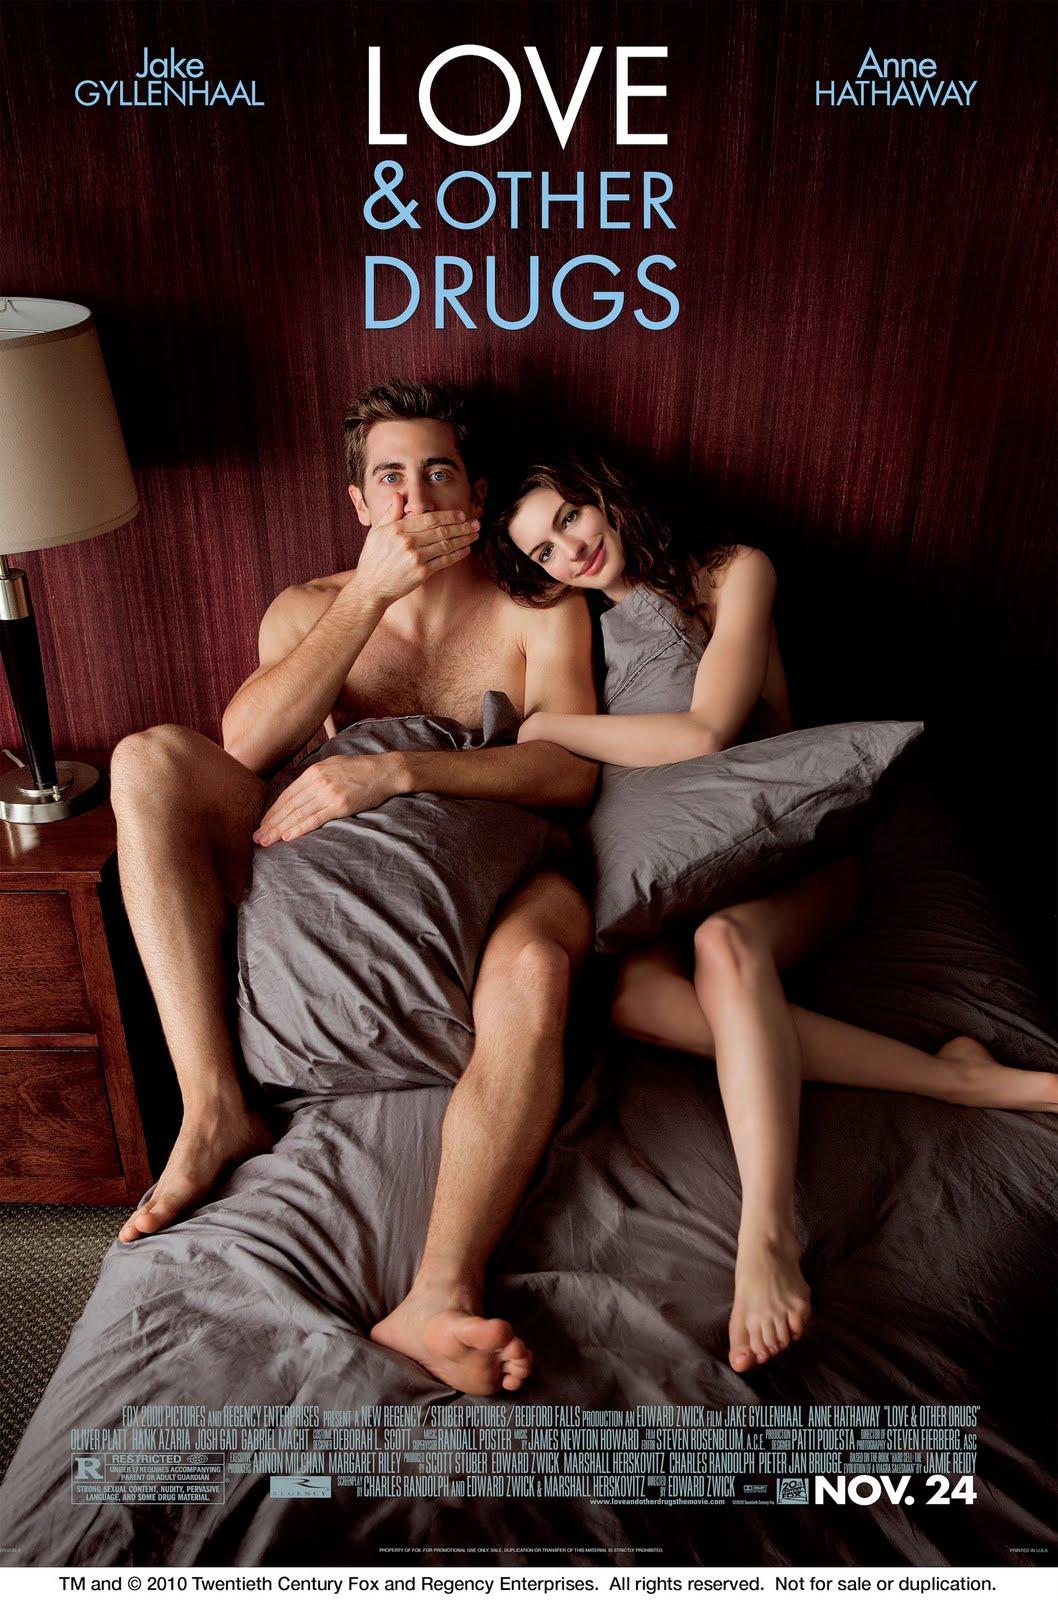 http://3.bp.blogspot.com/-nQ1EnI7e5nQ/TV2JPGMLhgI/AAAAAAAABXw/okmgOhtz6bA/s1600/love-and-other-drugs-poster_txt_rgb.jpg